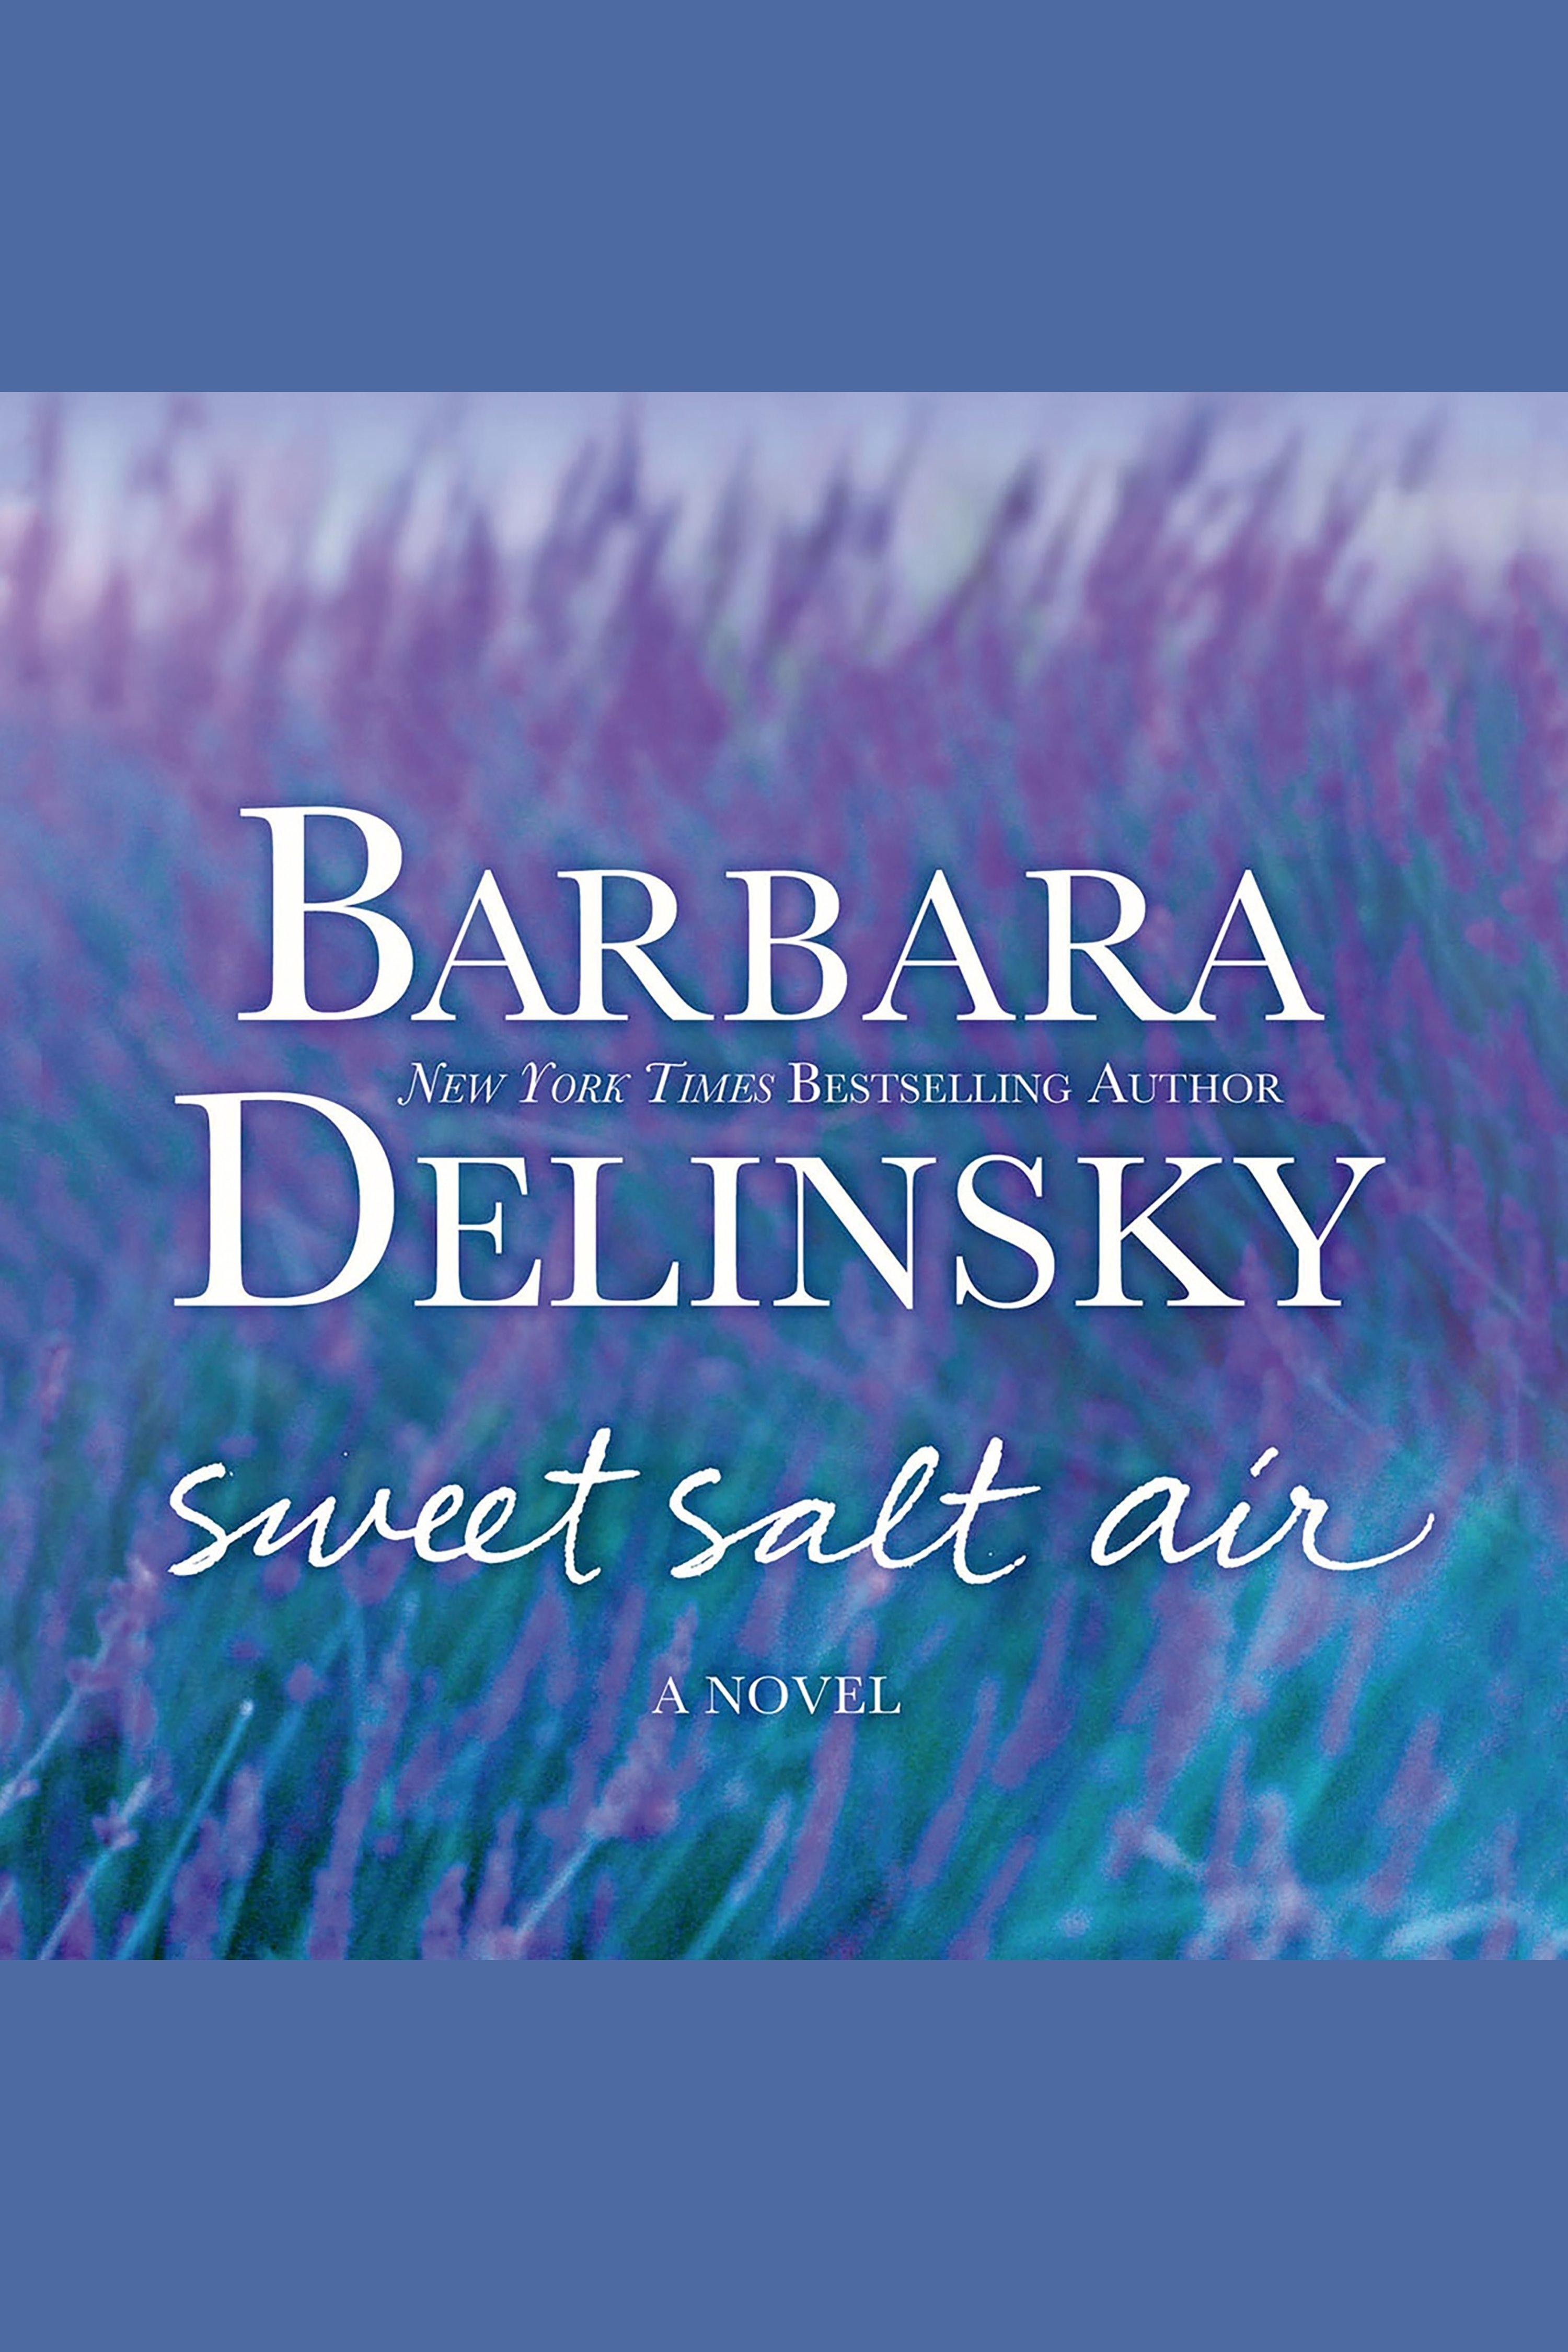 Sweet salt air cover image